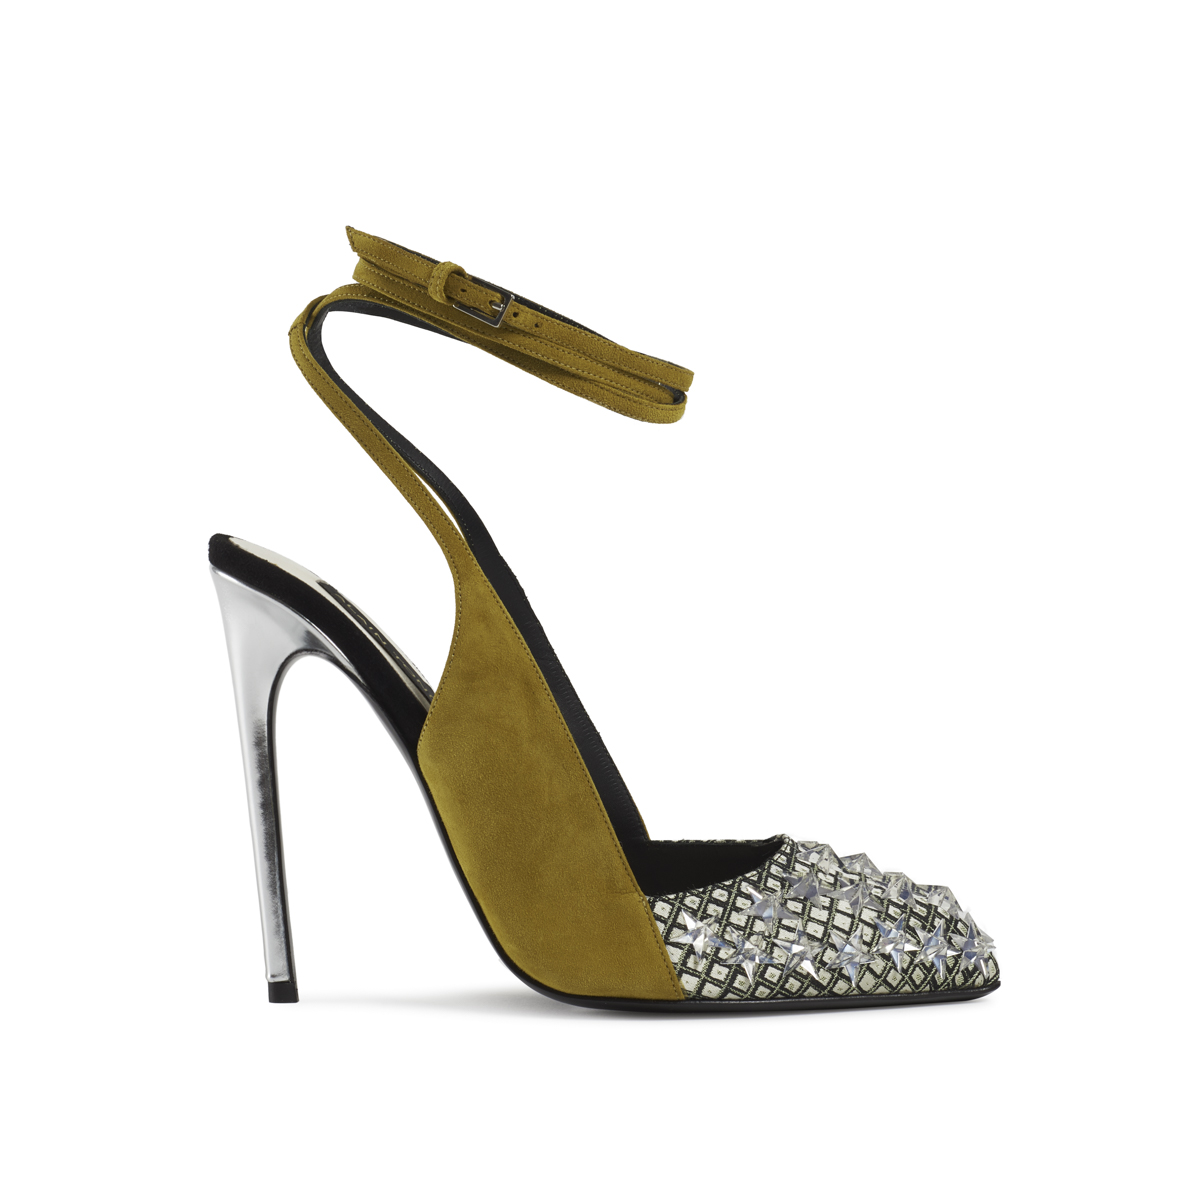 021_alaintondowski_springsummer2017_shoes_3061-077